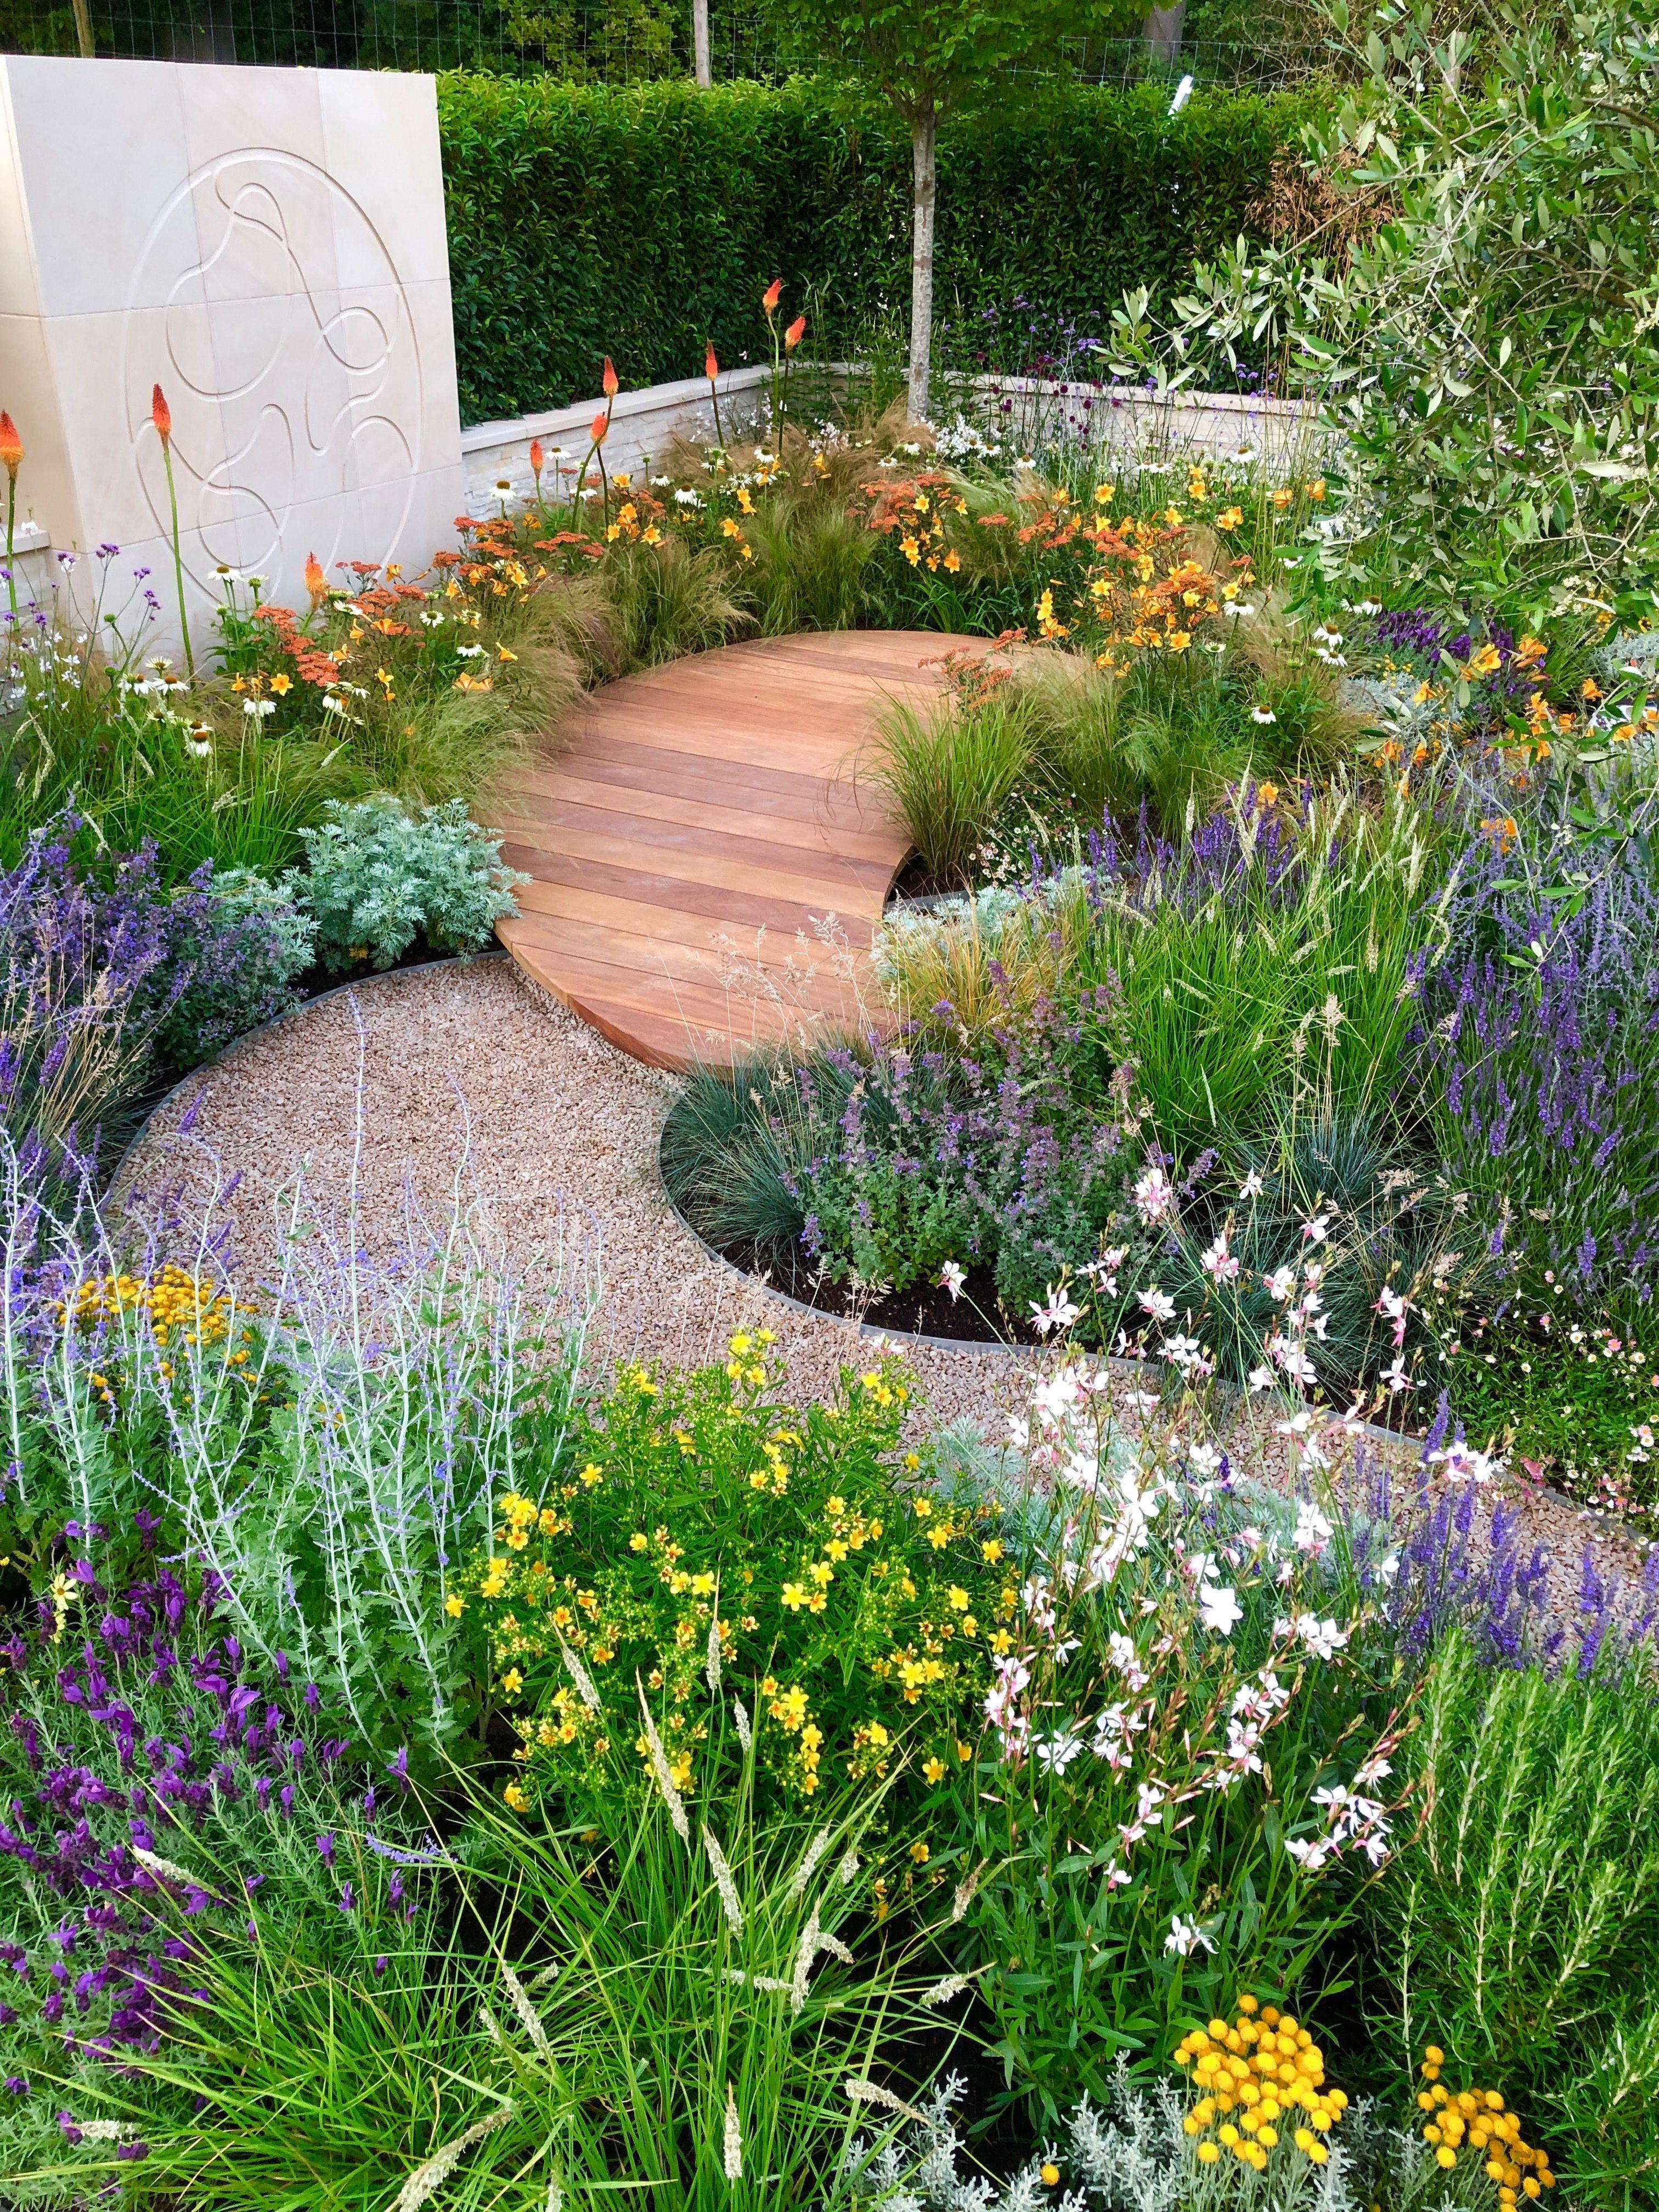 The Phytosanctuary Garden at 2019 RHS Tatton Flower Show ...